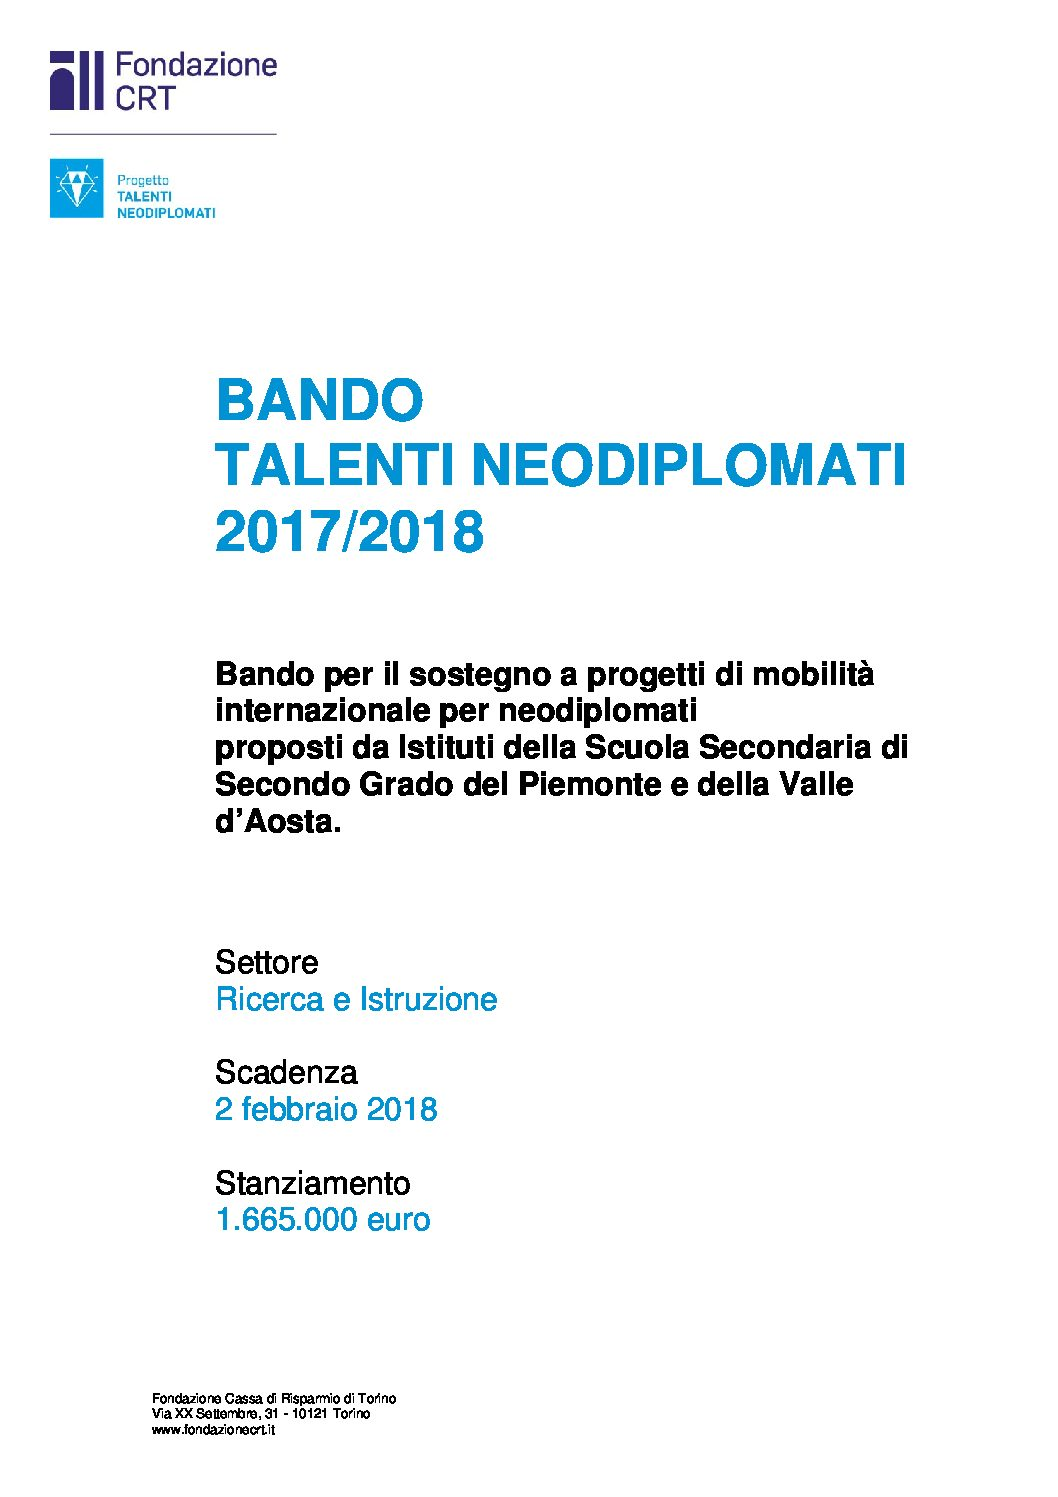 BANDO TALENTI NEODIPLOMATI 2017/2018